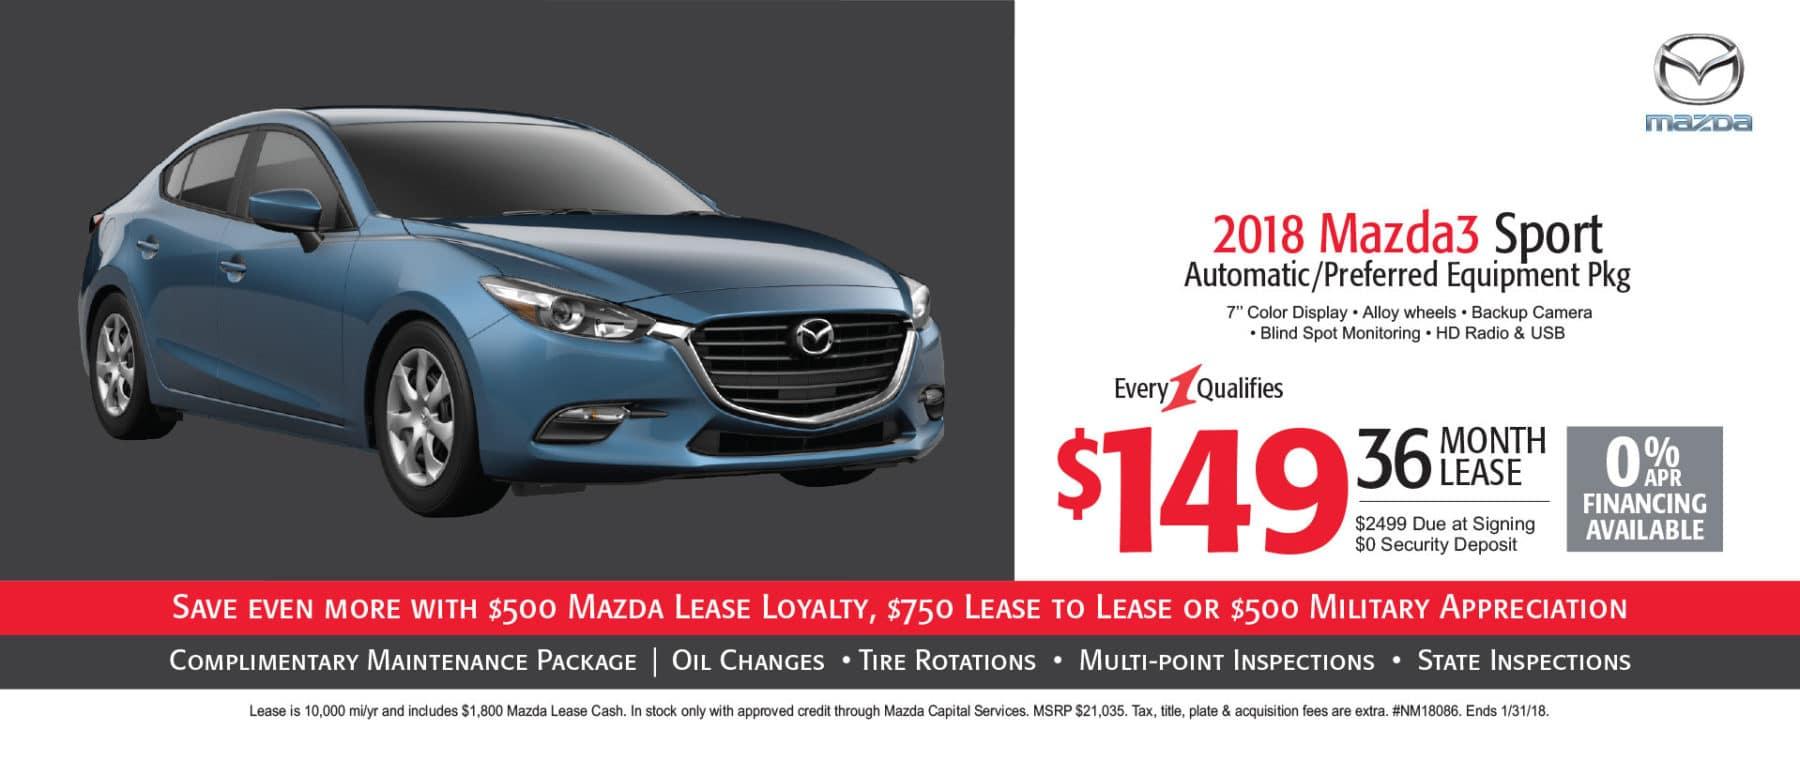 1 Cochran Monroeville >> Cochran Mazda of Monroeville | Mazda Dealer in Monroeville, PA